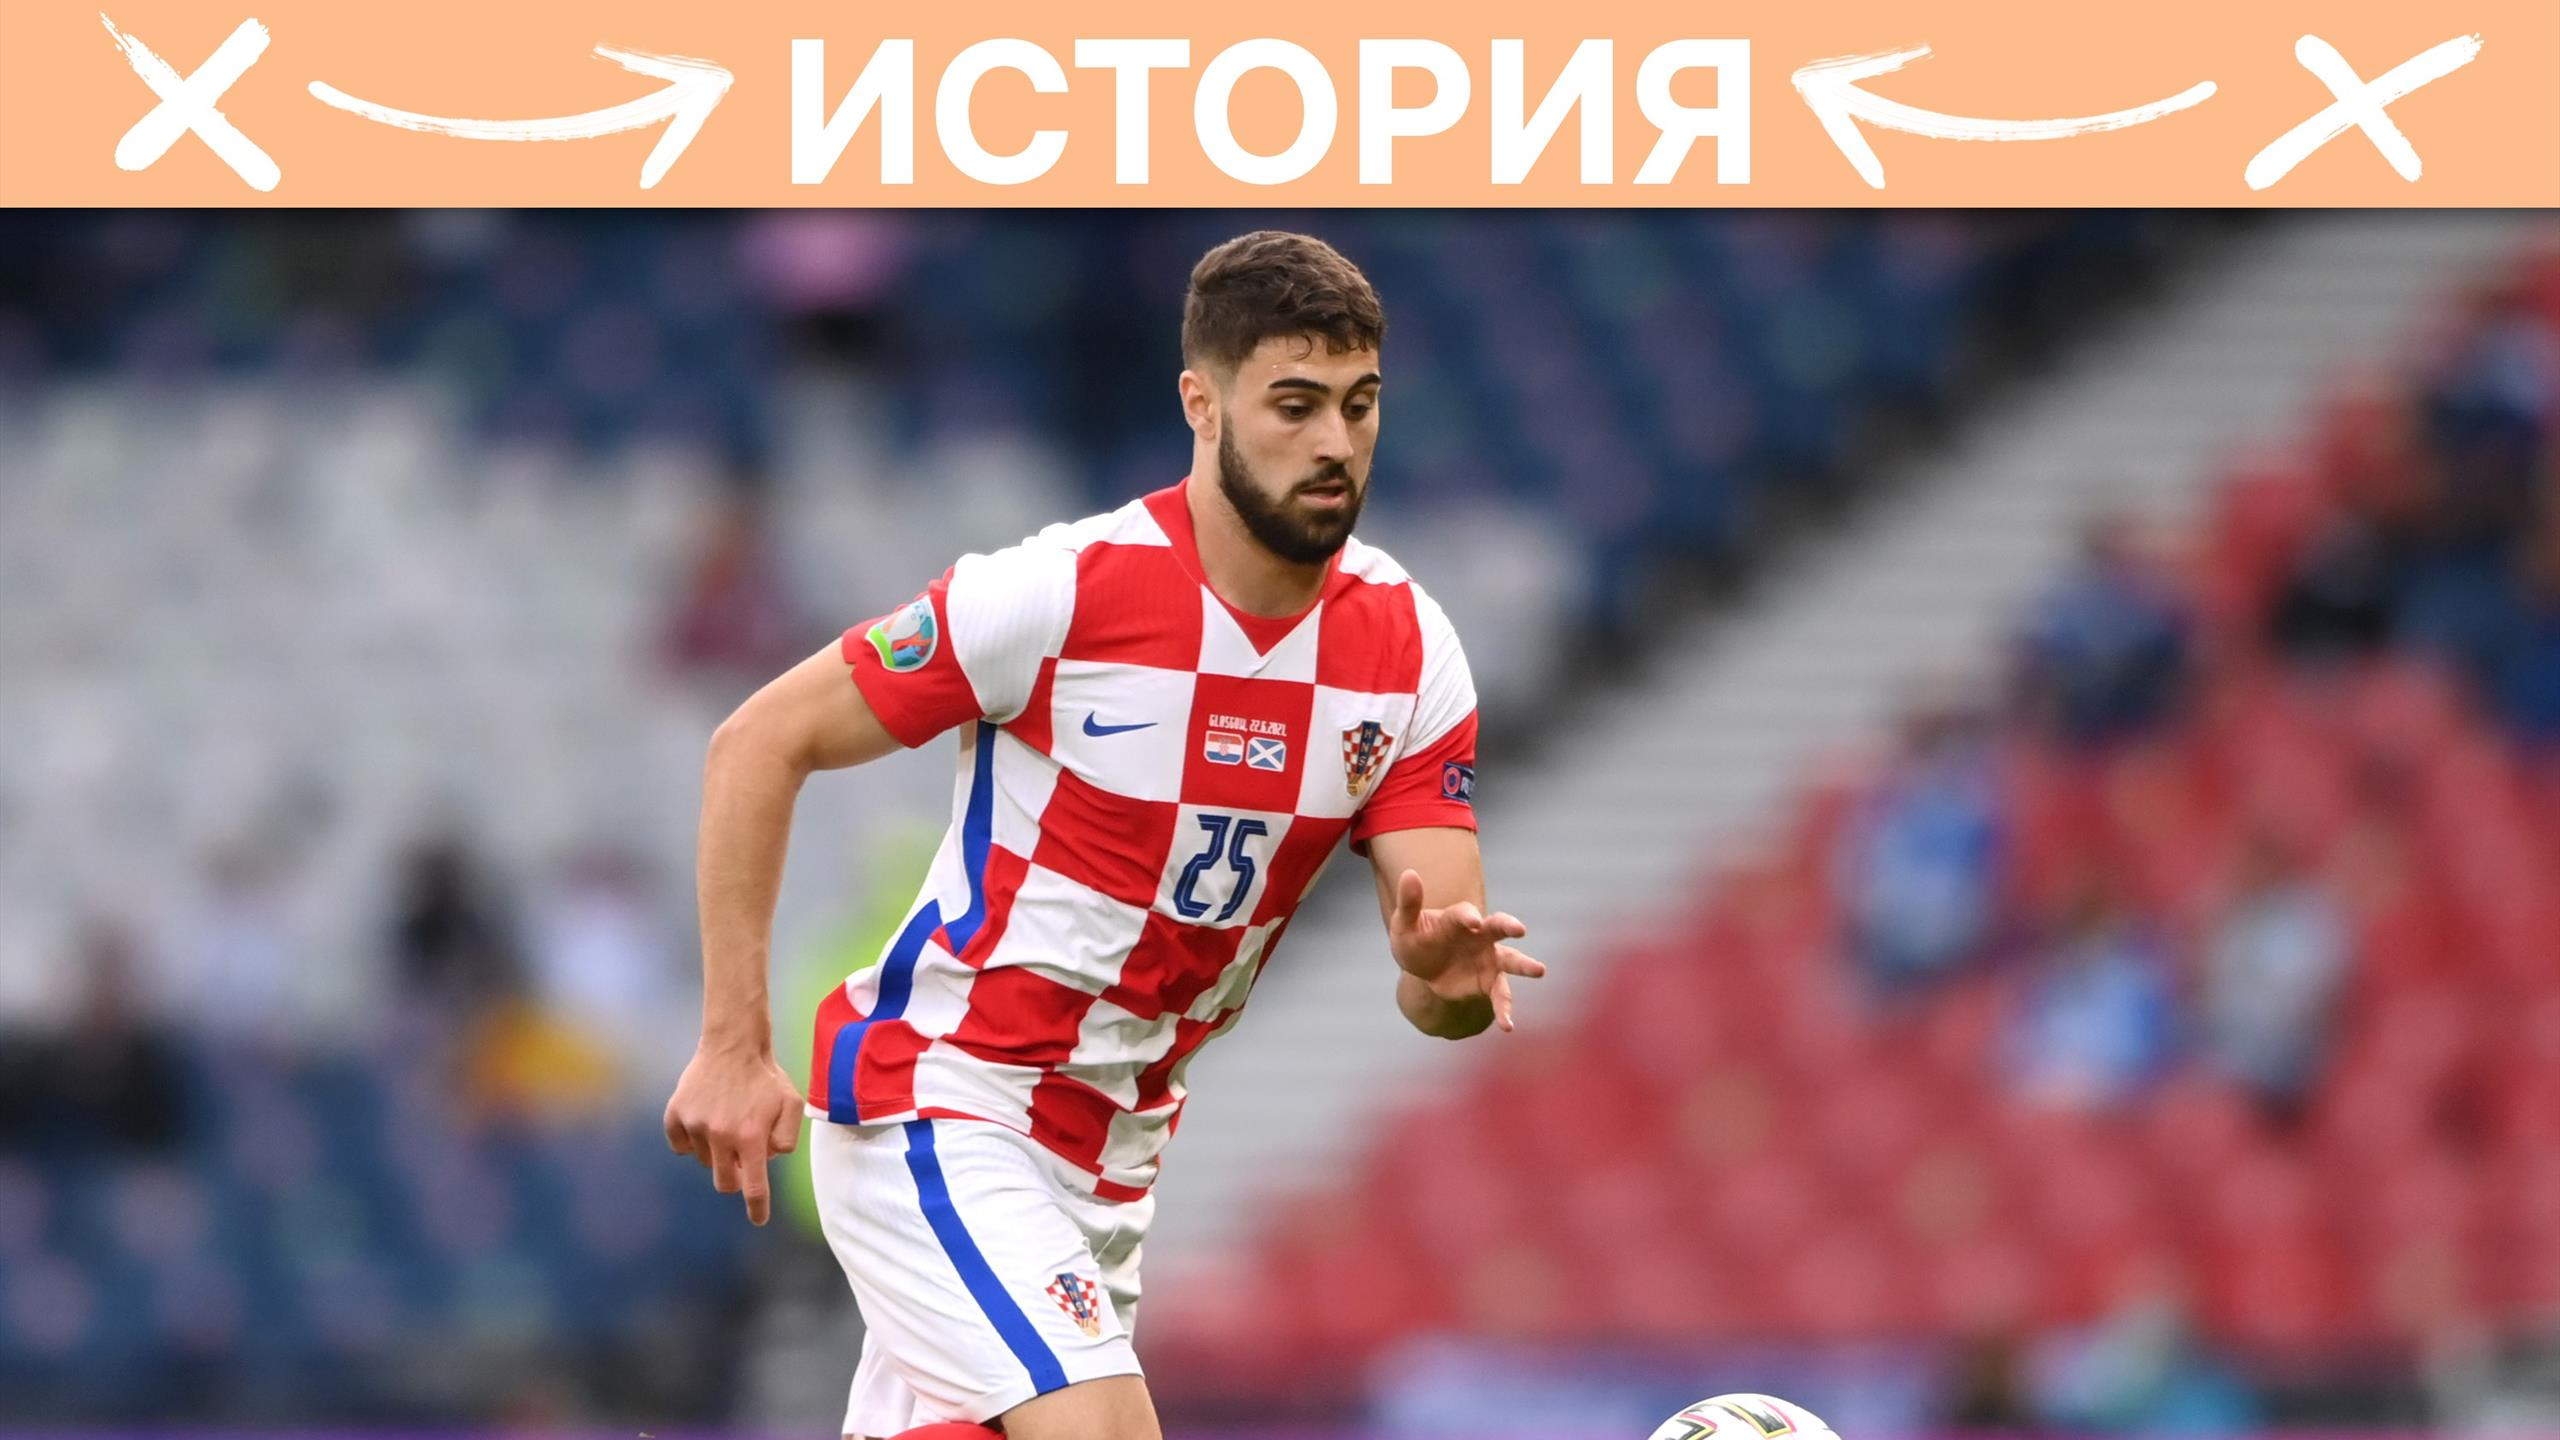 Новая звезда Хорватии. Однофамилец Пепа, но фанат «Ливерпуля»